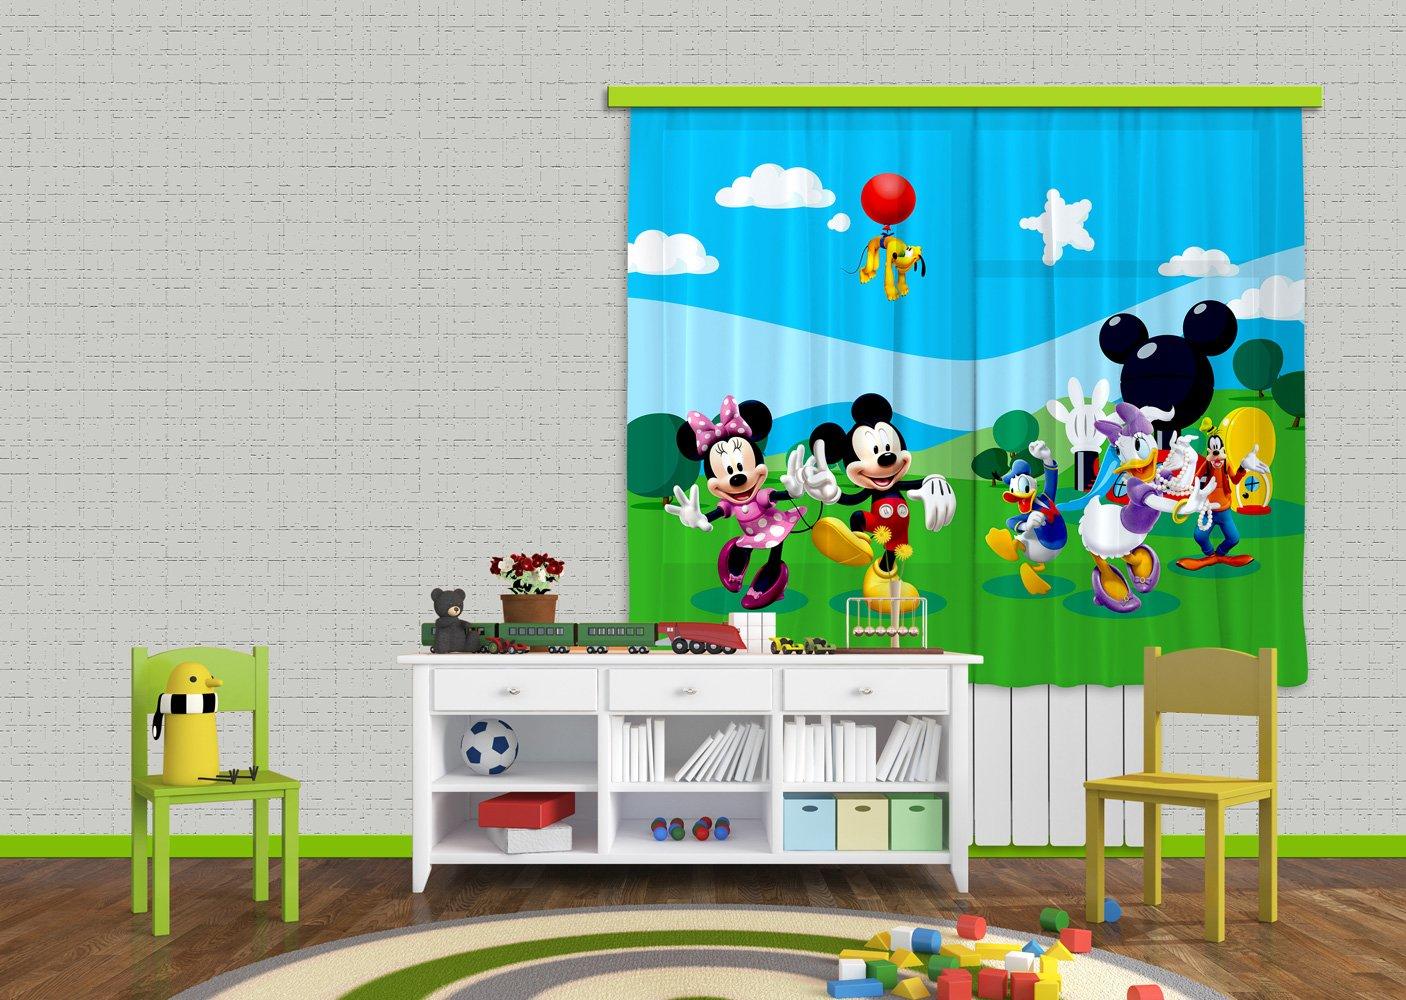 AG Design FCS xl 4307 - Tende per camera bambini, motivo Topolino Disney FCSXL 4307